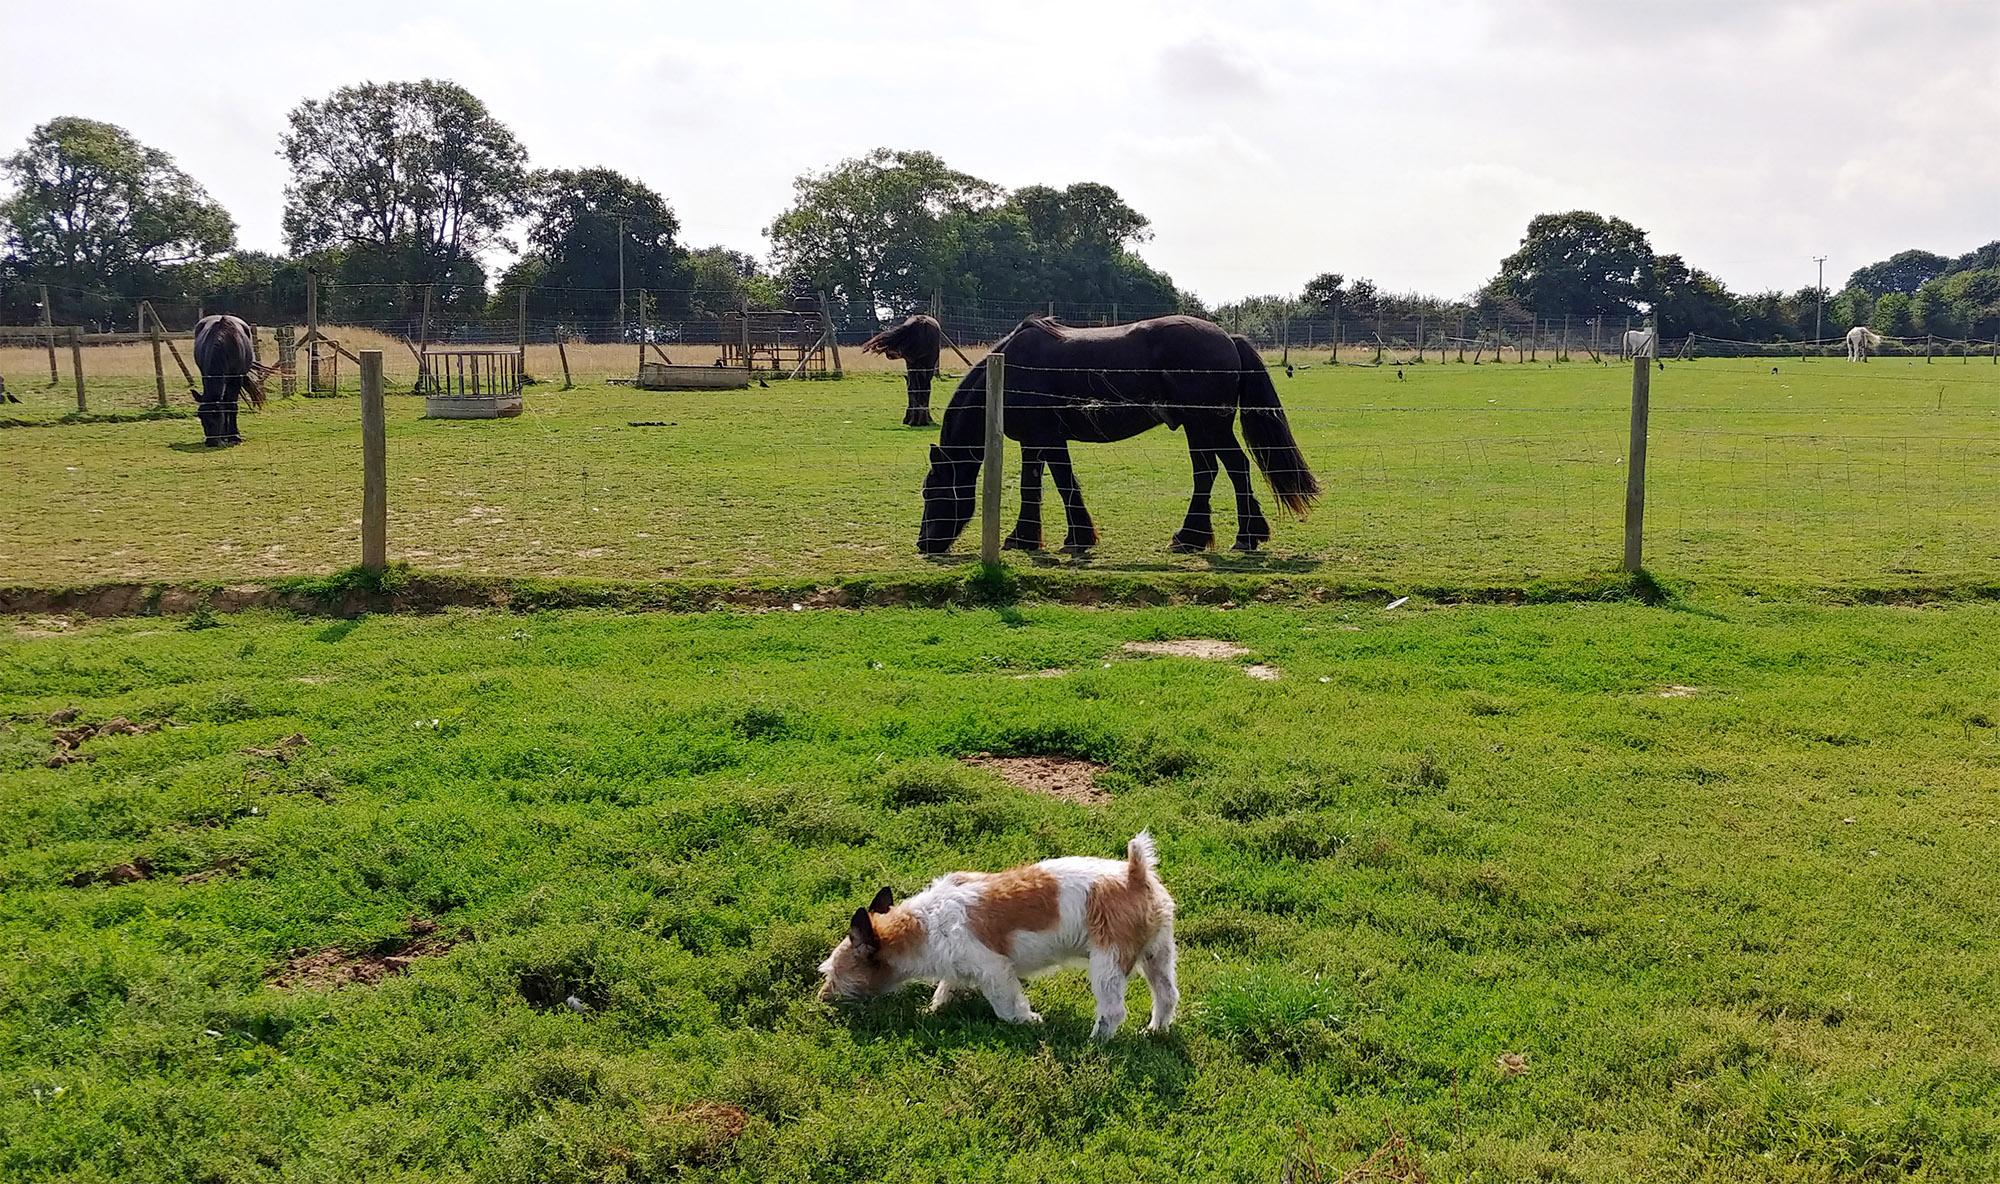 Big furry Rixy strollin' around the field.